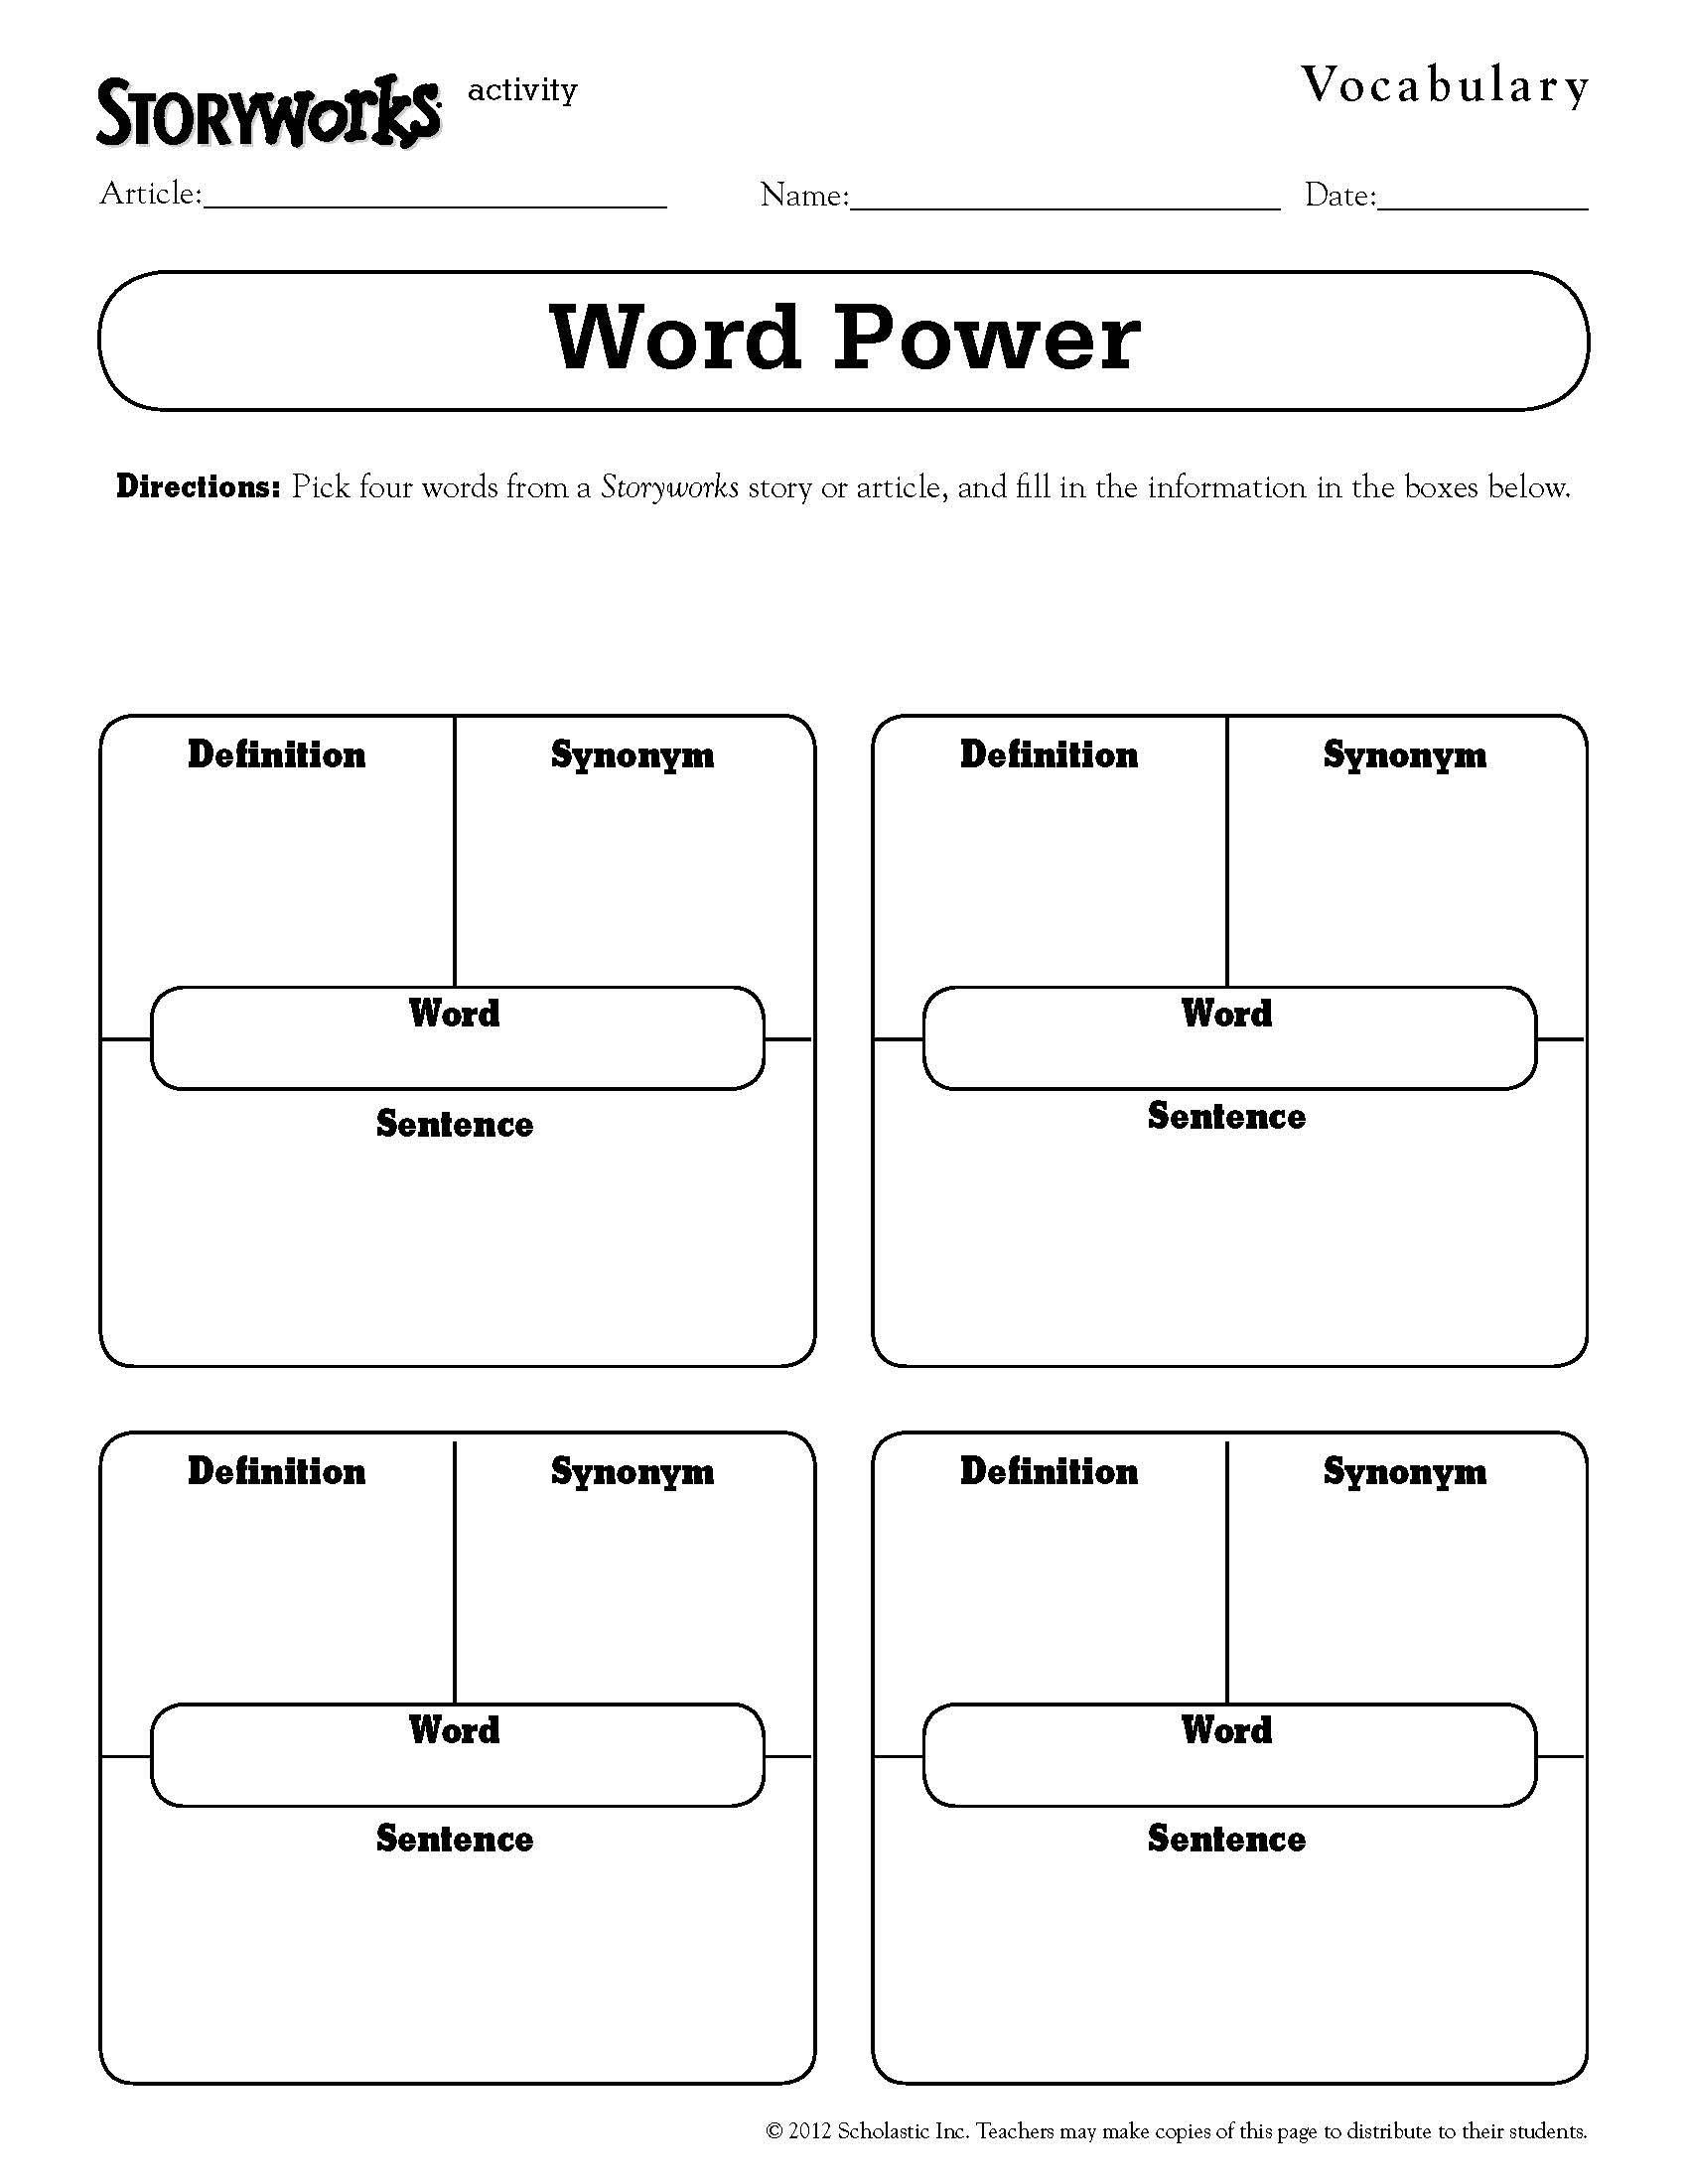 Free Vocabulary Graphic Organizer | Reading | Vocabulary ...